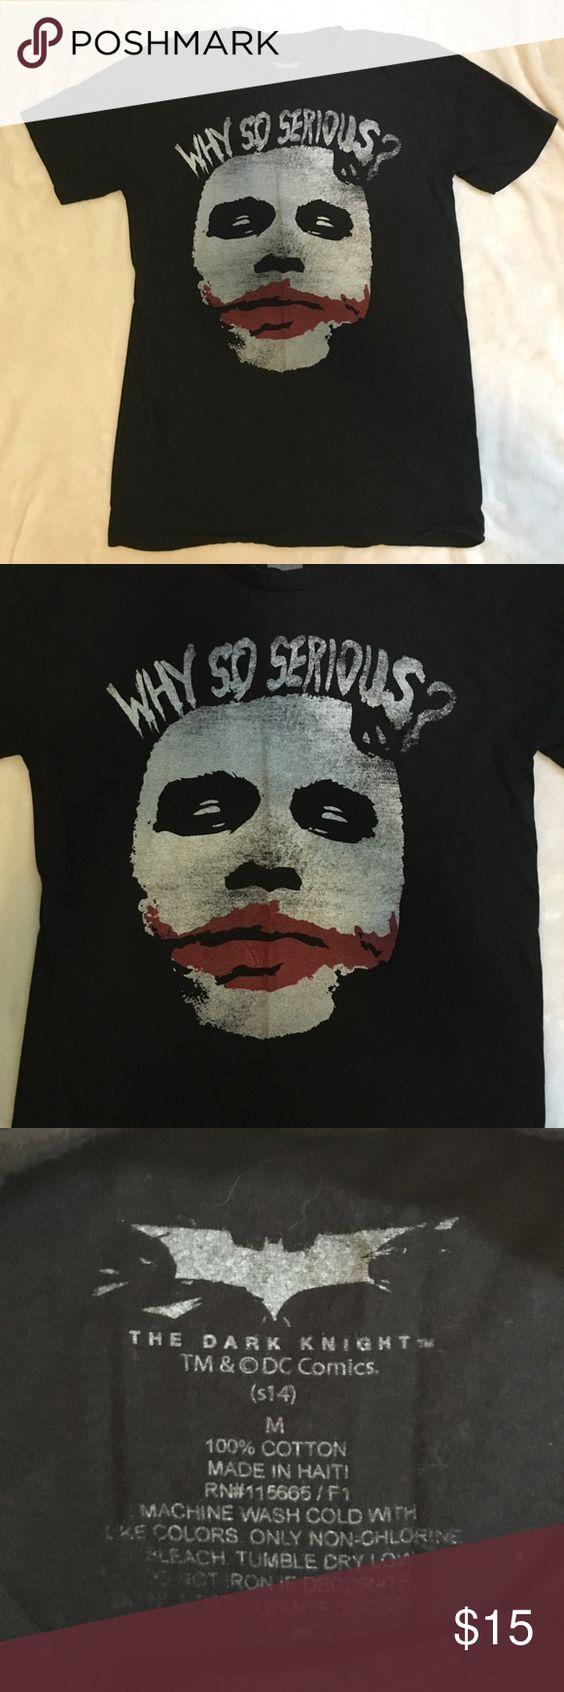 Black t shirts kohls - Batman T Shirt By Kohl S Features The Dark Knight Trilogy S Joker Heath Ledger